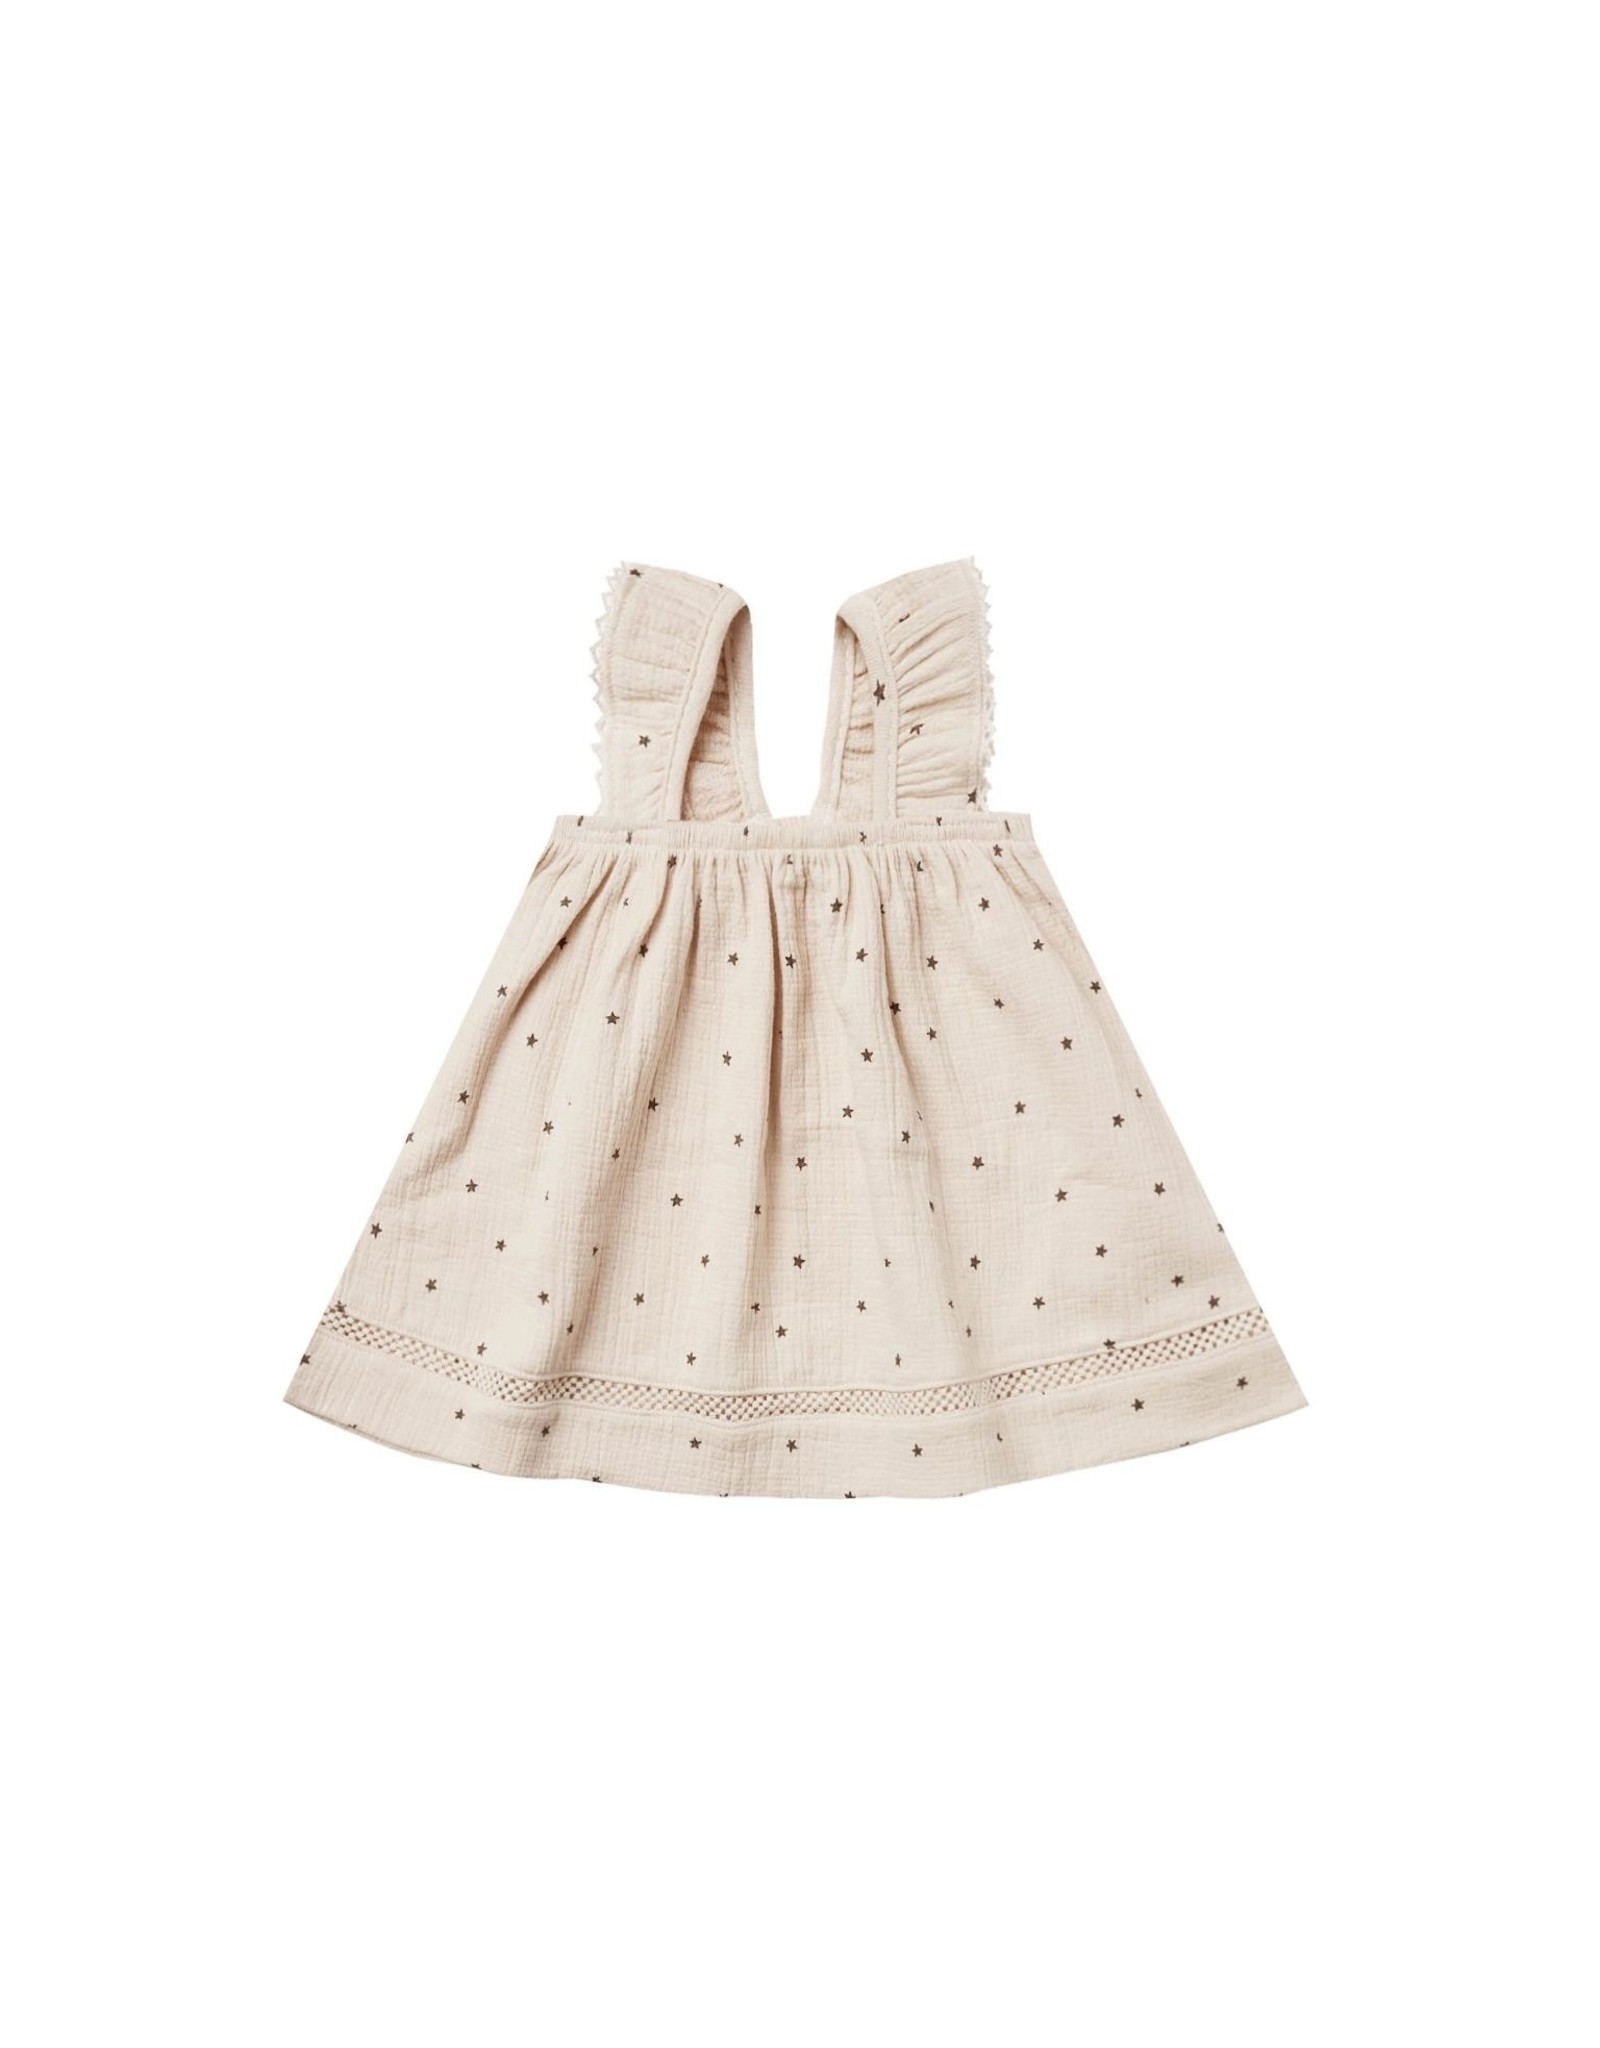 Quincy Mae woven ruffle dress- natural